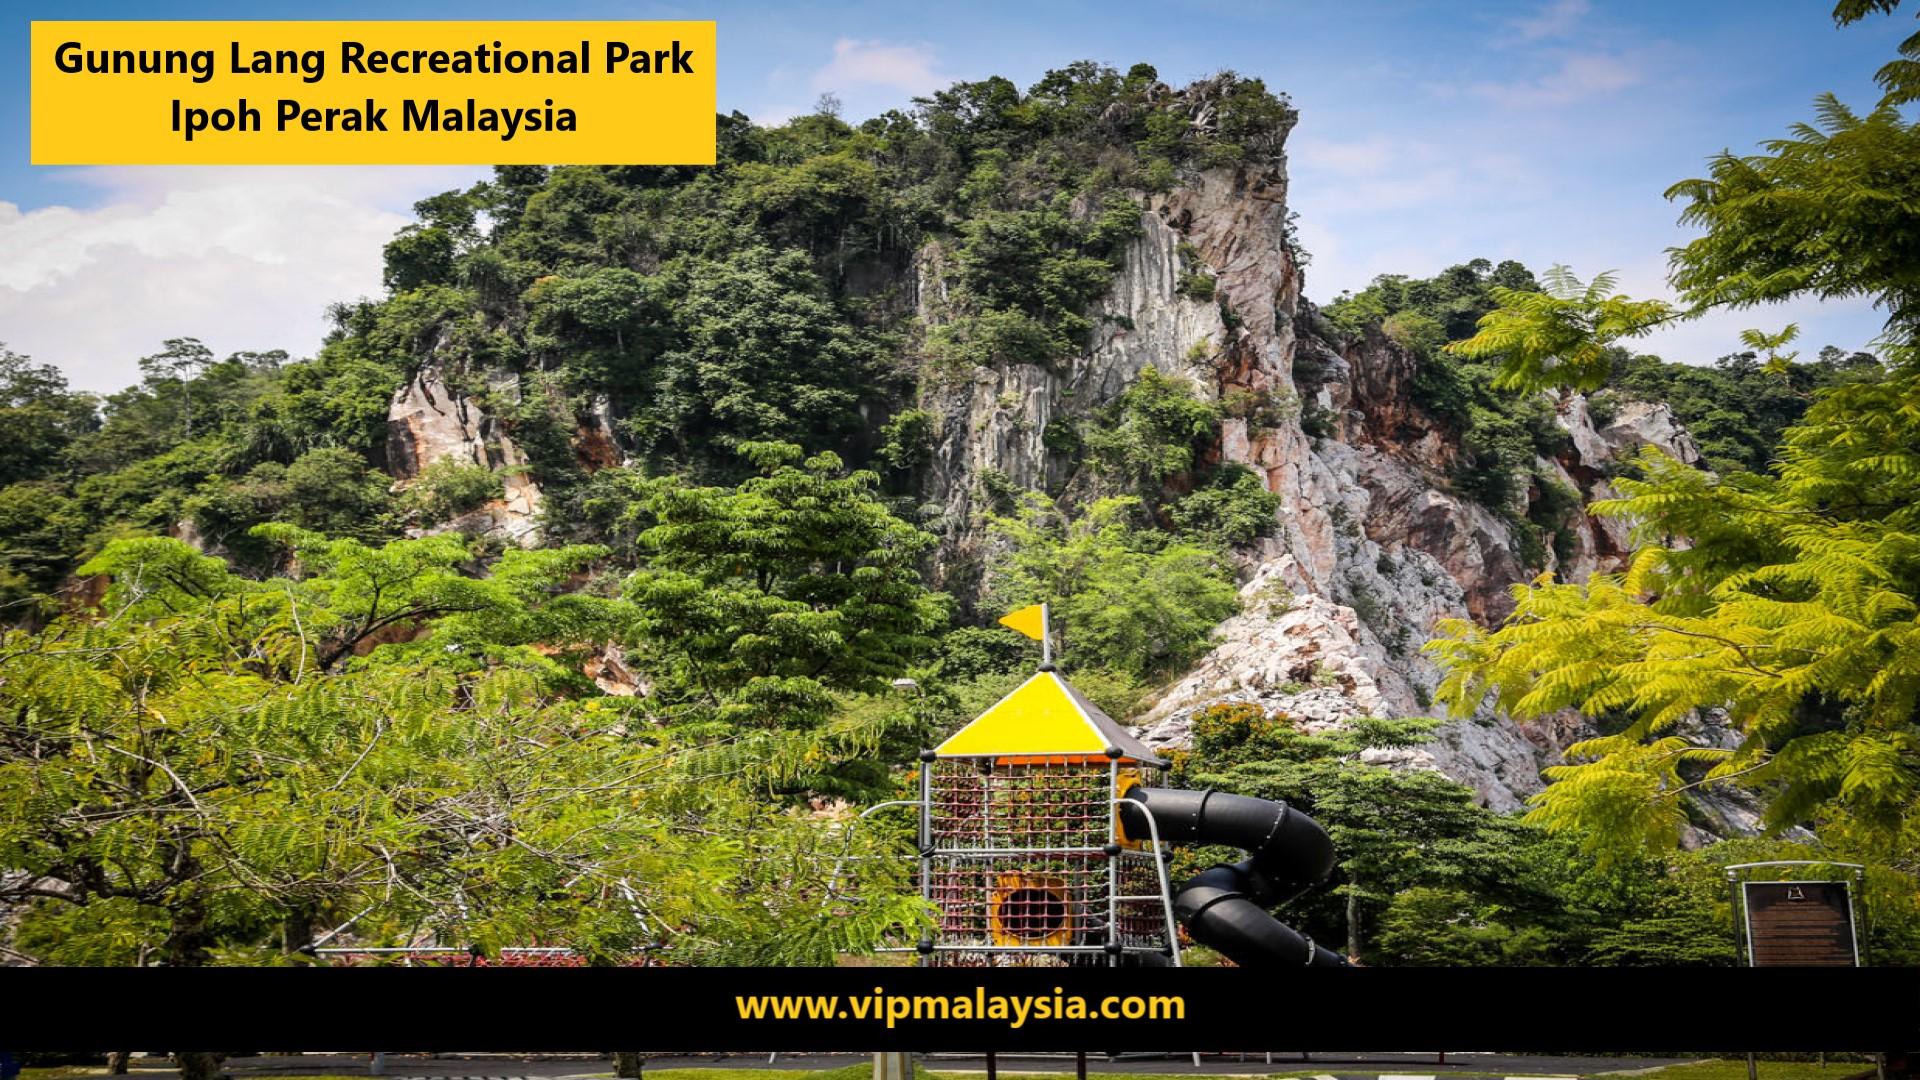 Gunung Lang Recreational Park Ipoh Perak Malaysia